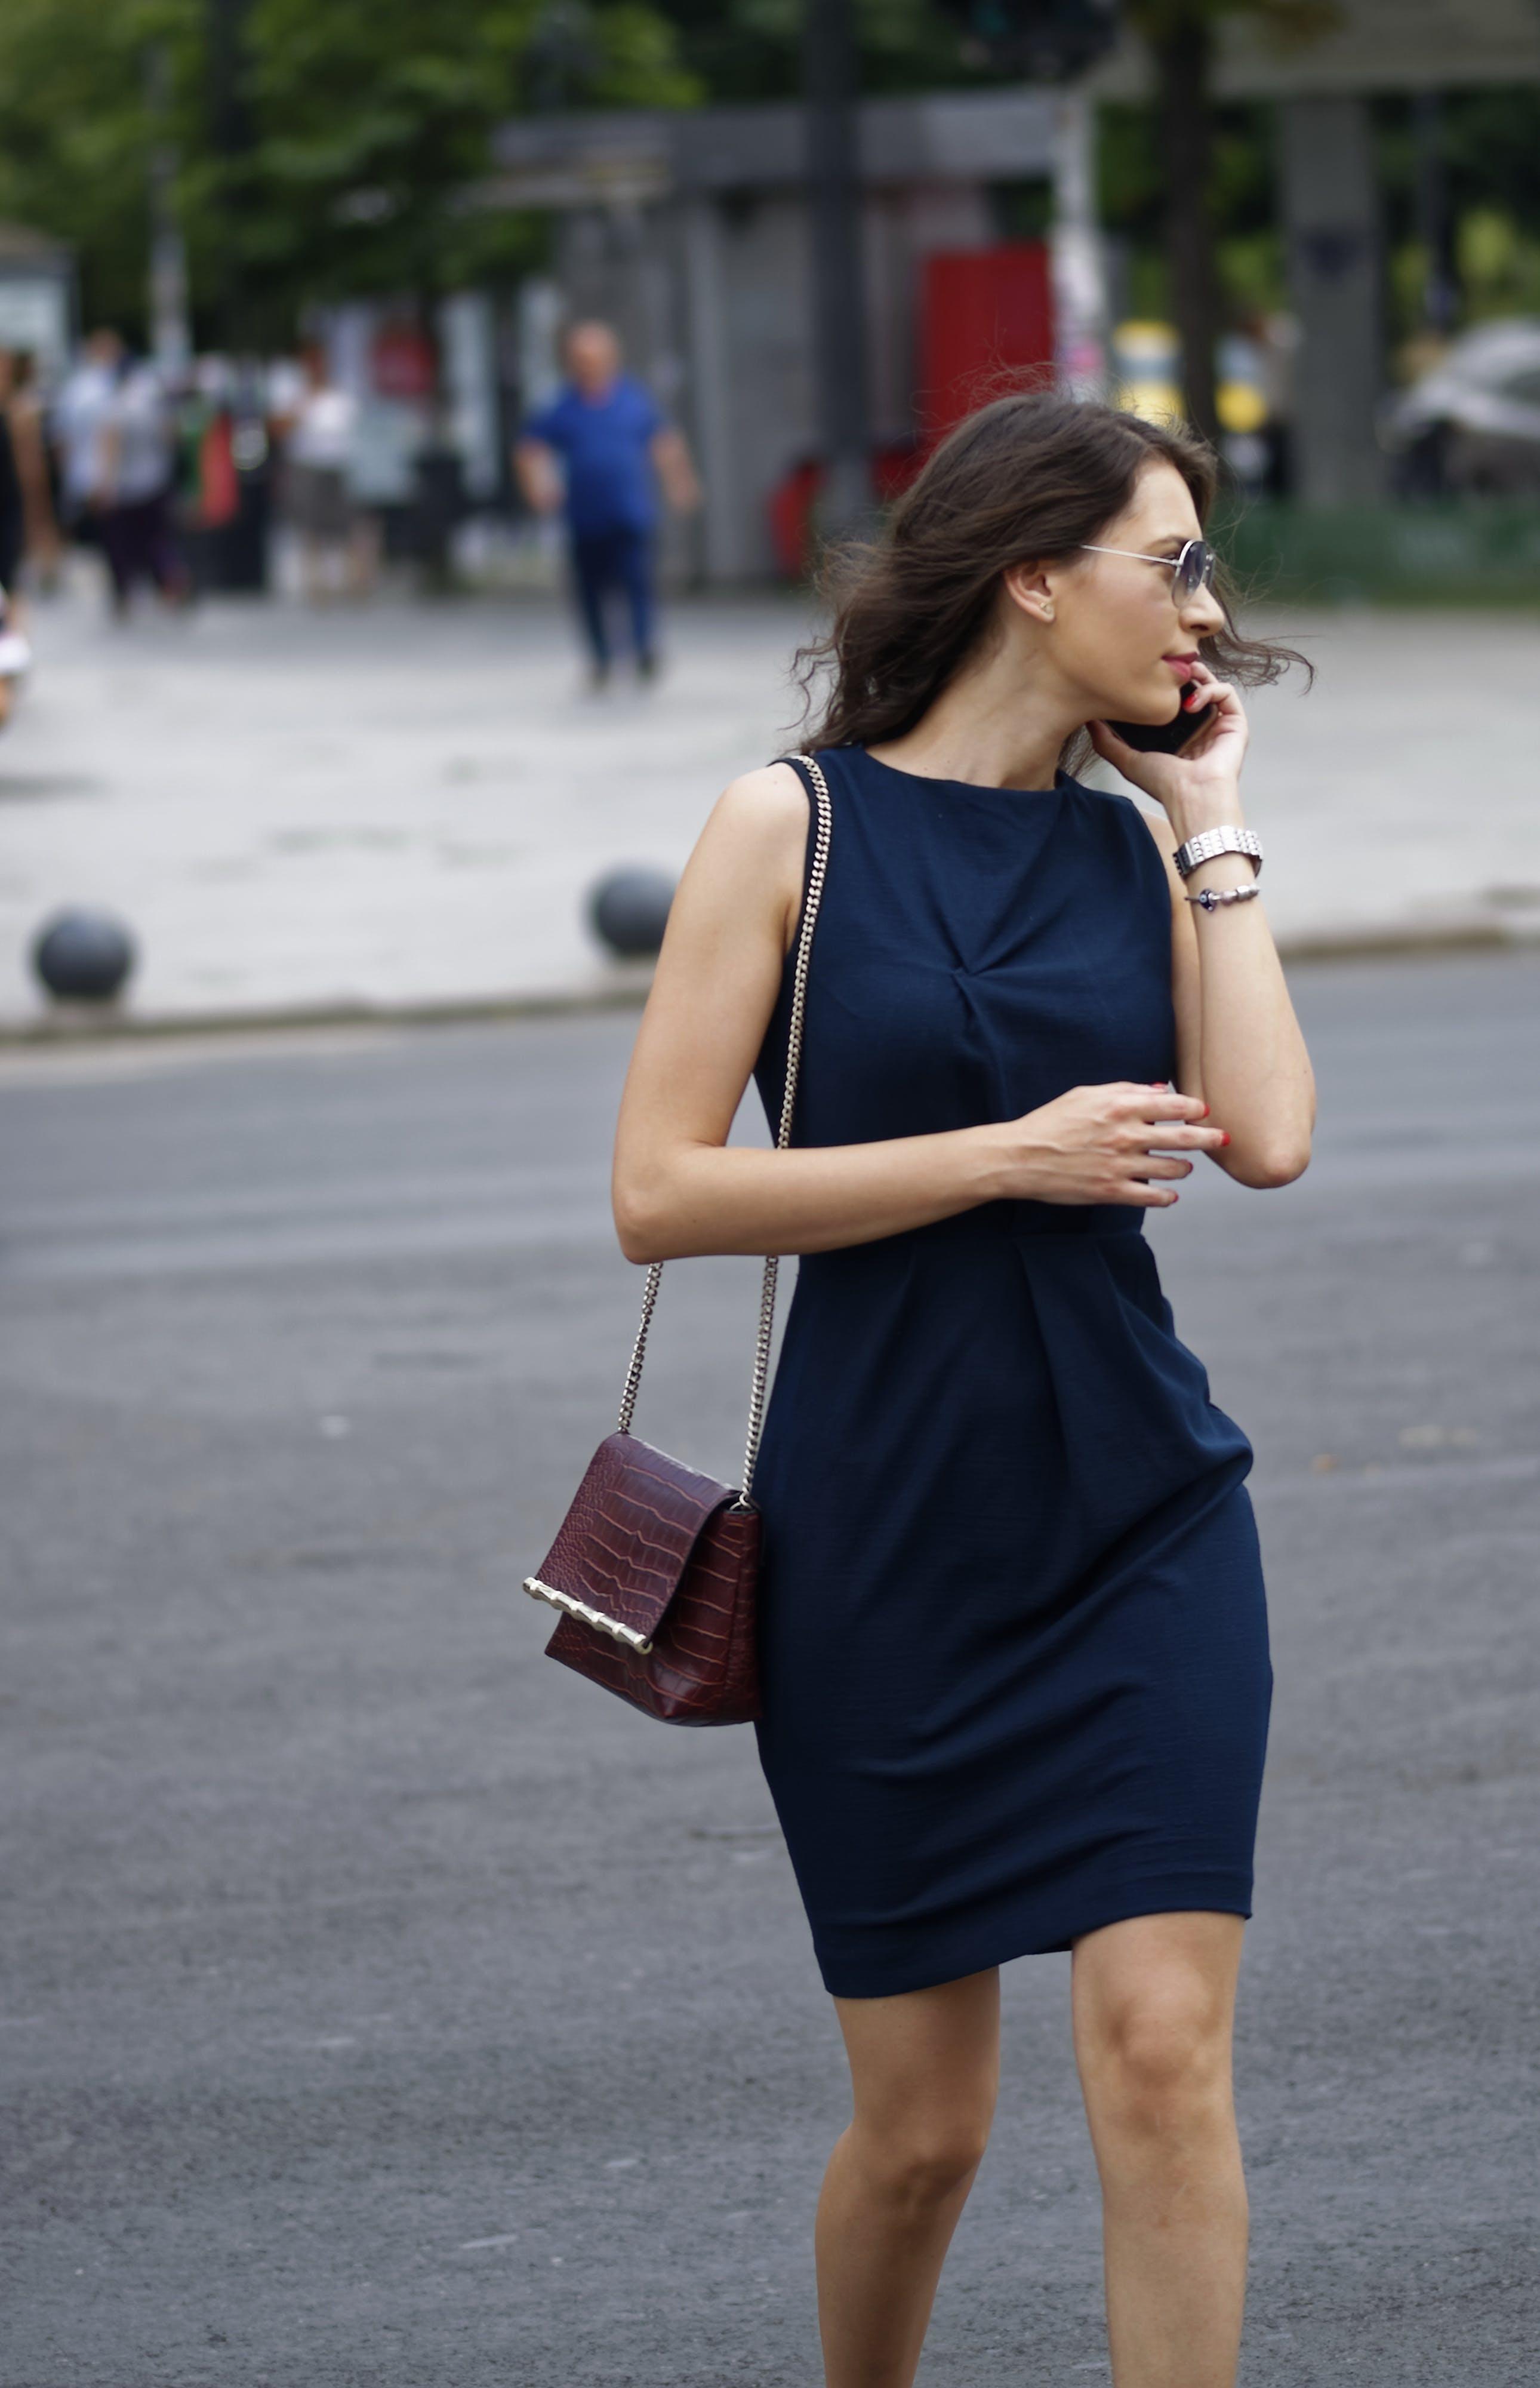 Woman Wearing Black Sleeveless Bodycon Mini Dress